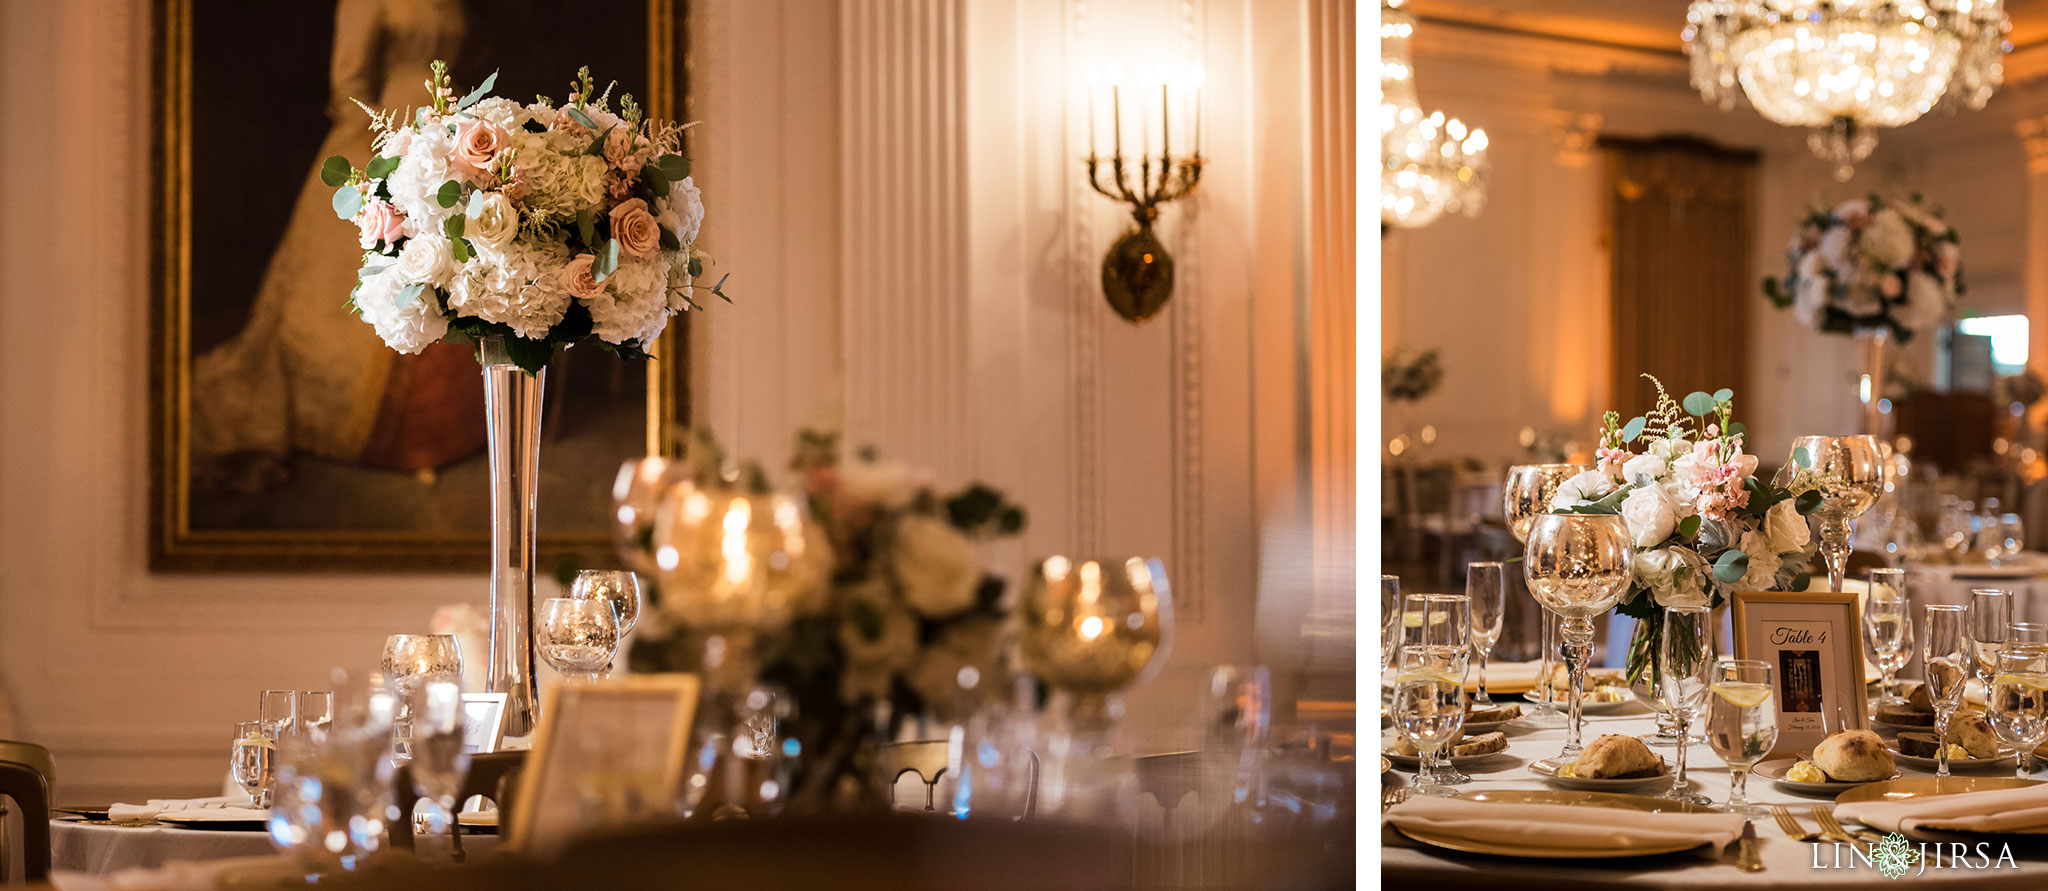 22 richard nixon library wedding reception photography